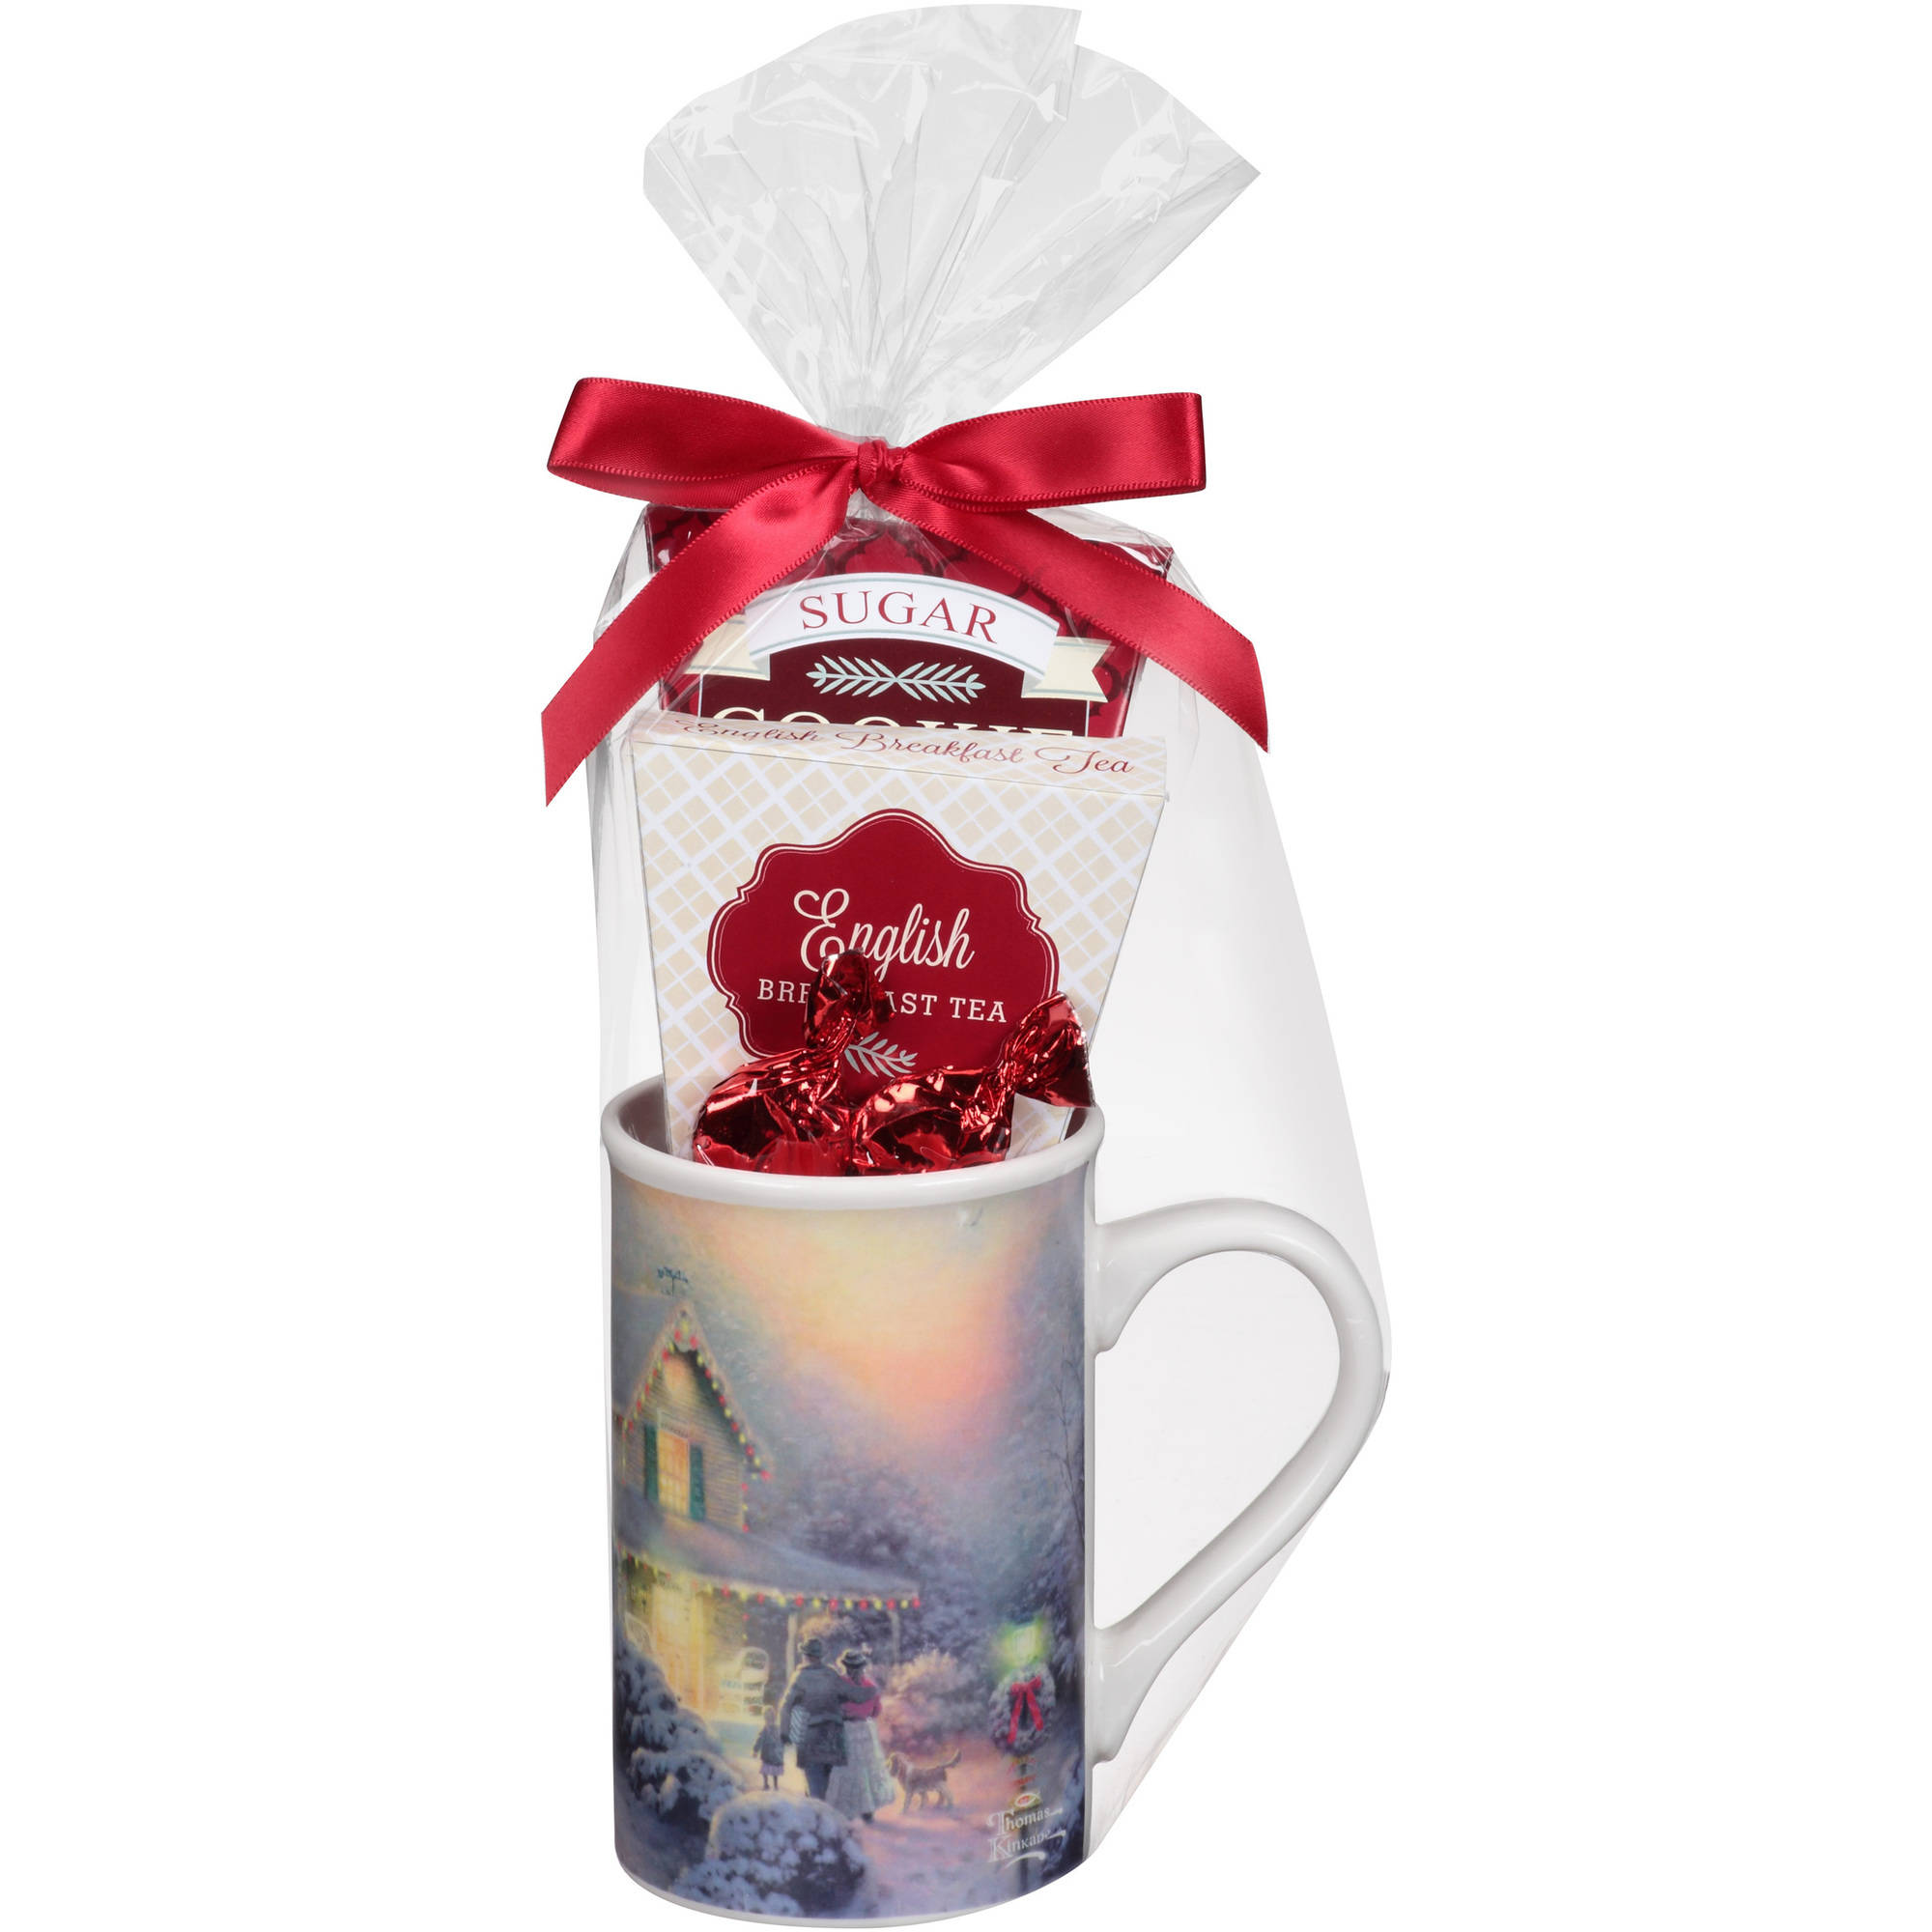 Thomas Kinkade Tea Mug Holiday Gift Set, 4 pc